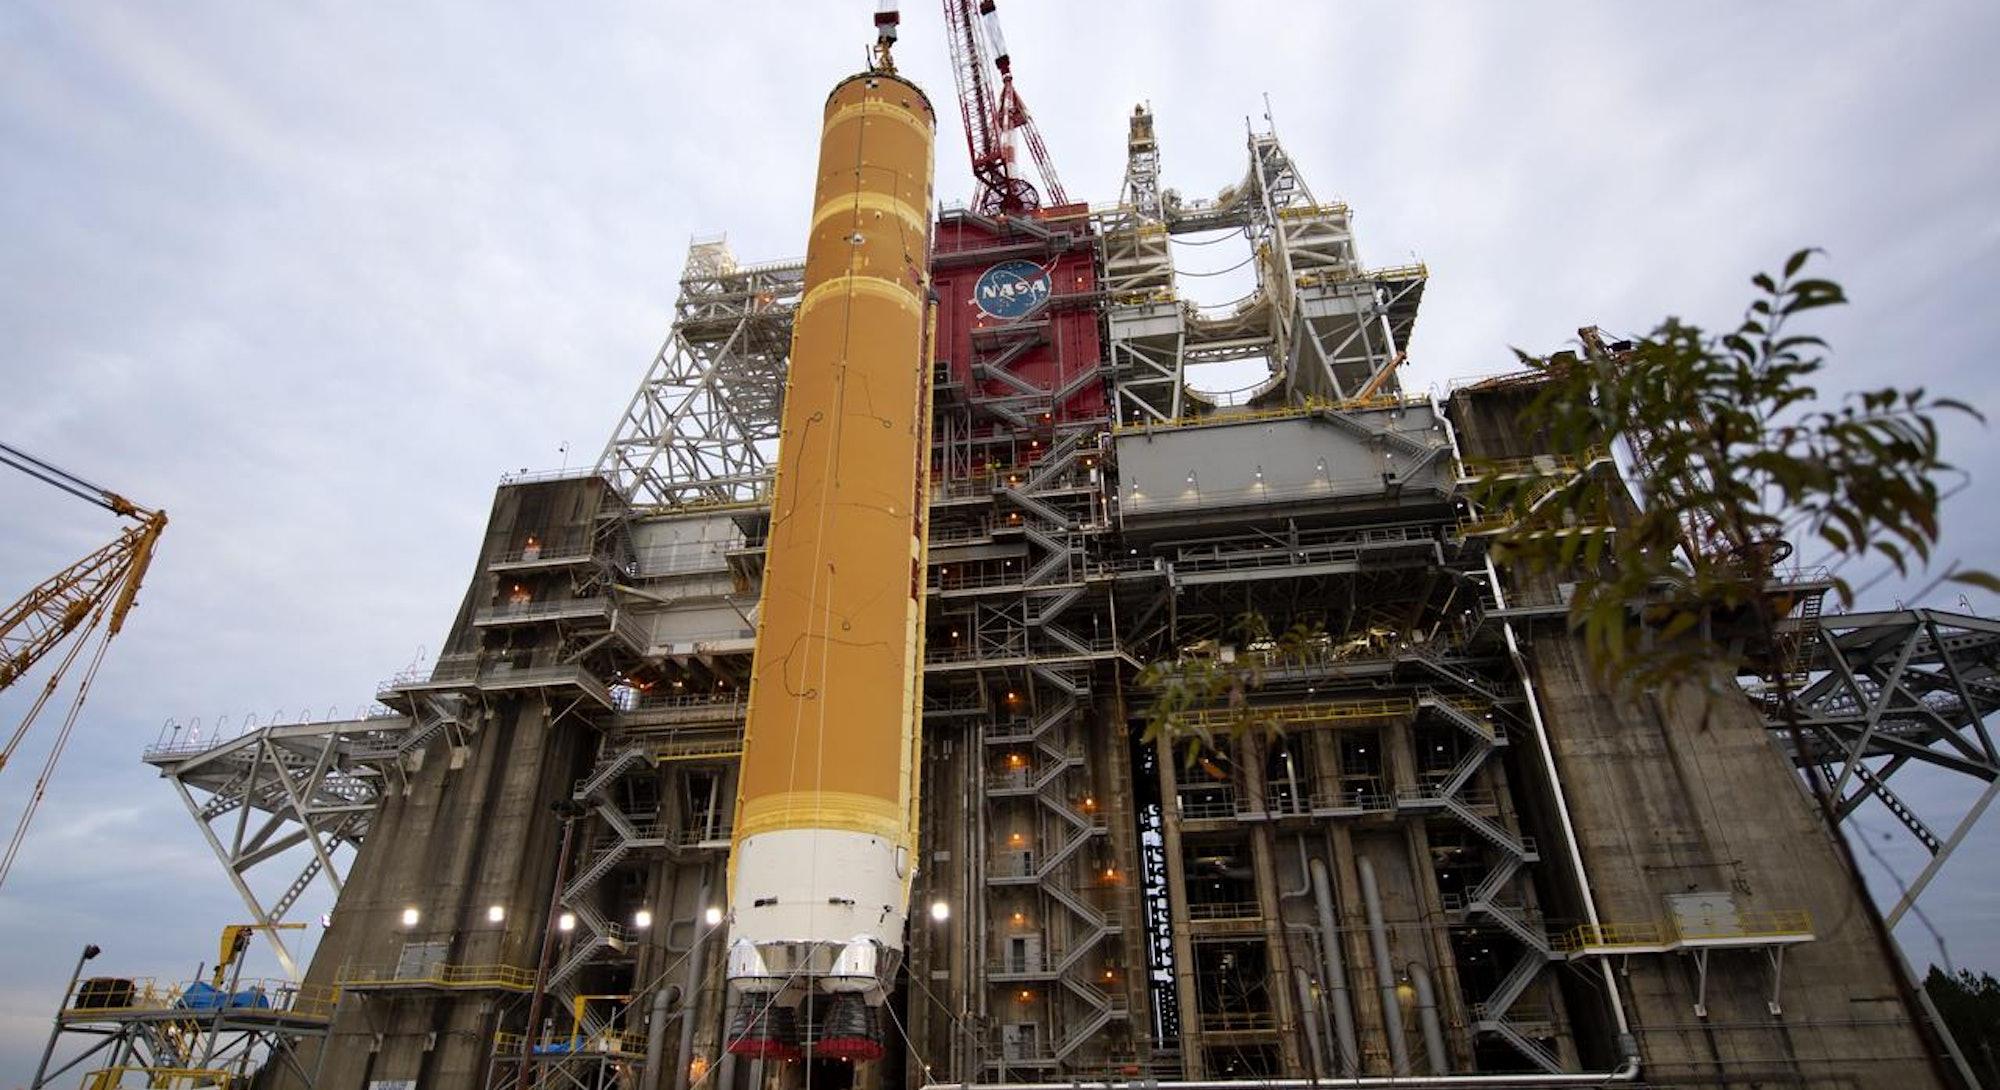 NASA SLS rocket core preparing for hot fire test